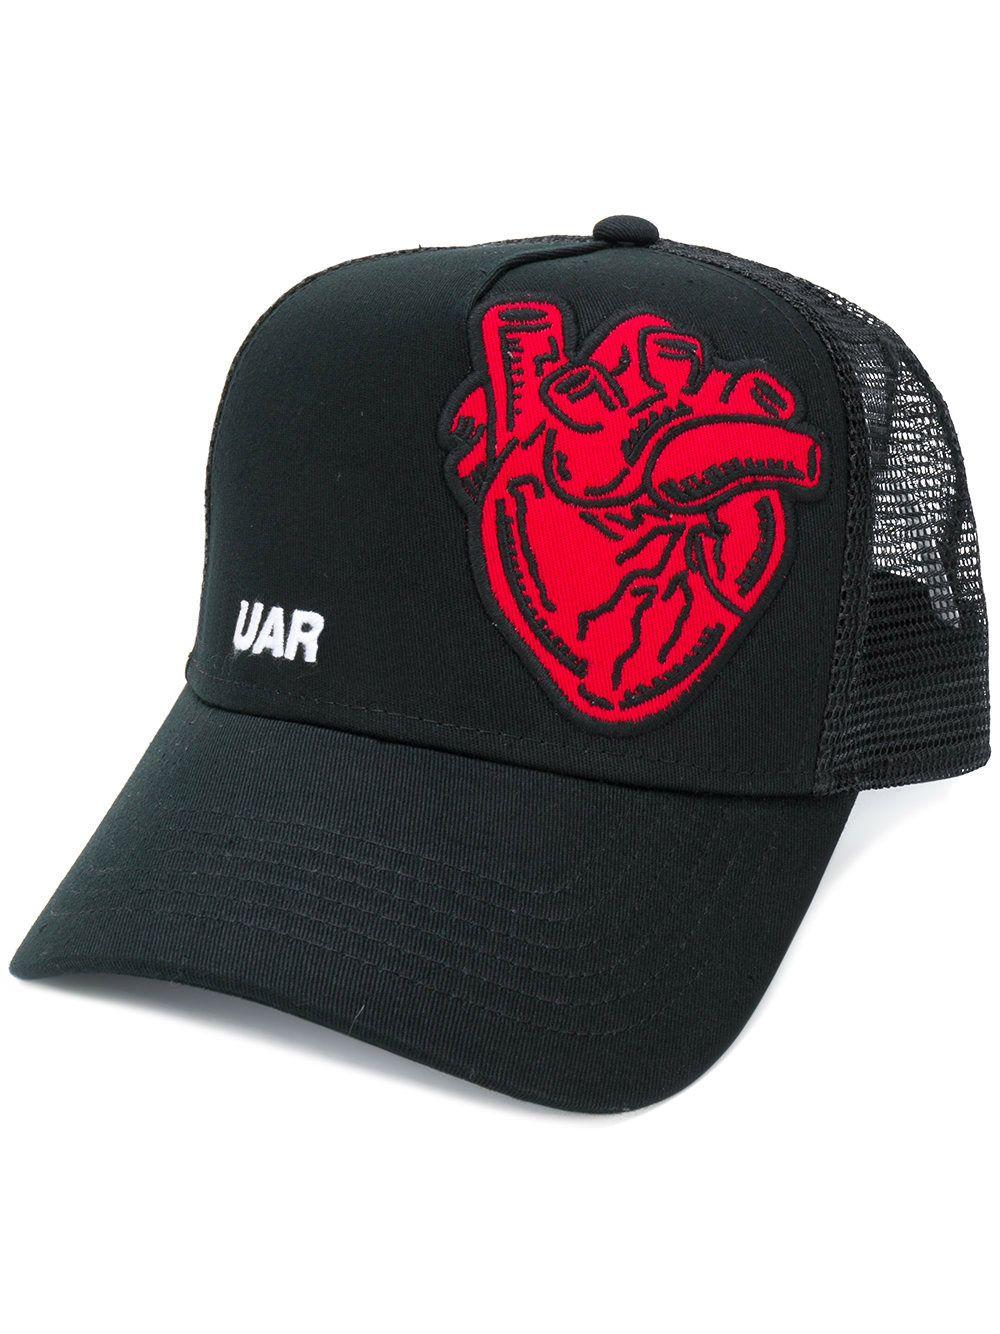 1e298763a8e8a Fashion Cap Baseball Cap Snapback Hat Red Heart Embroidery Casquette ...